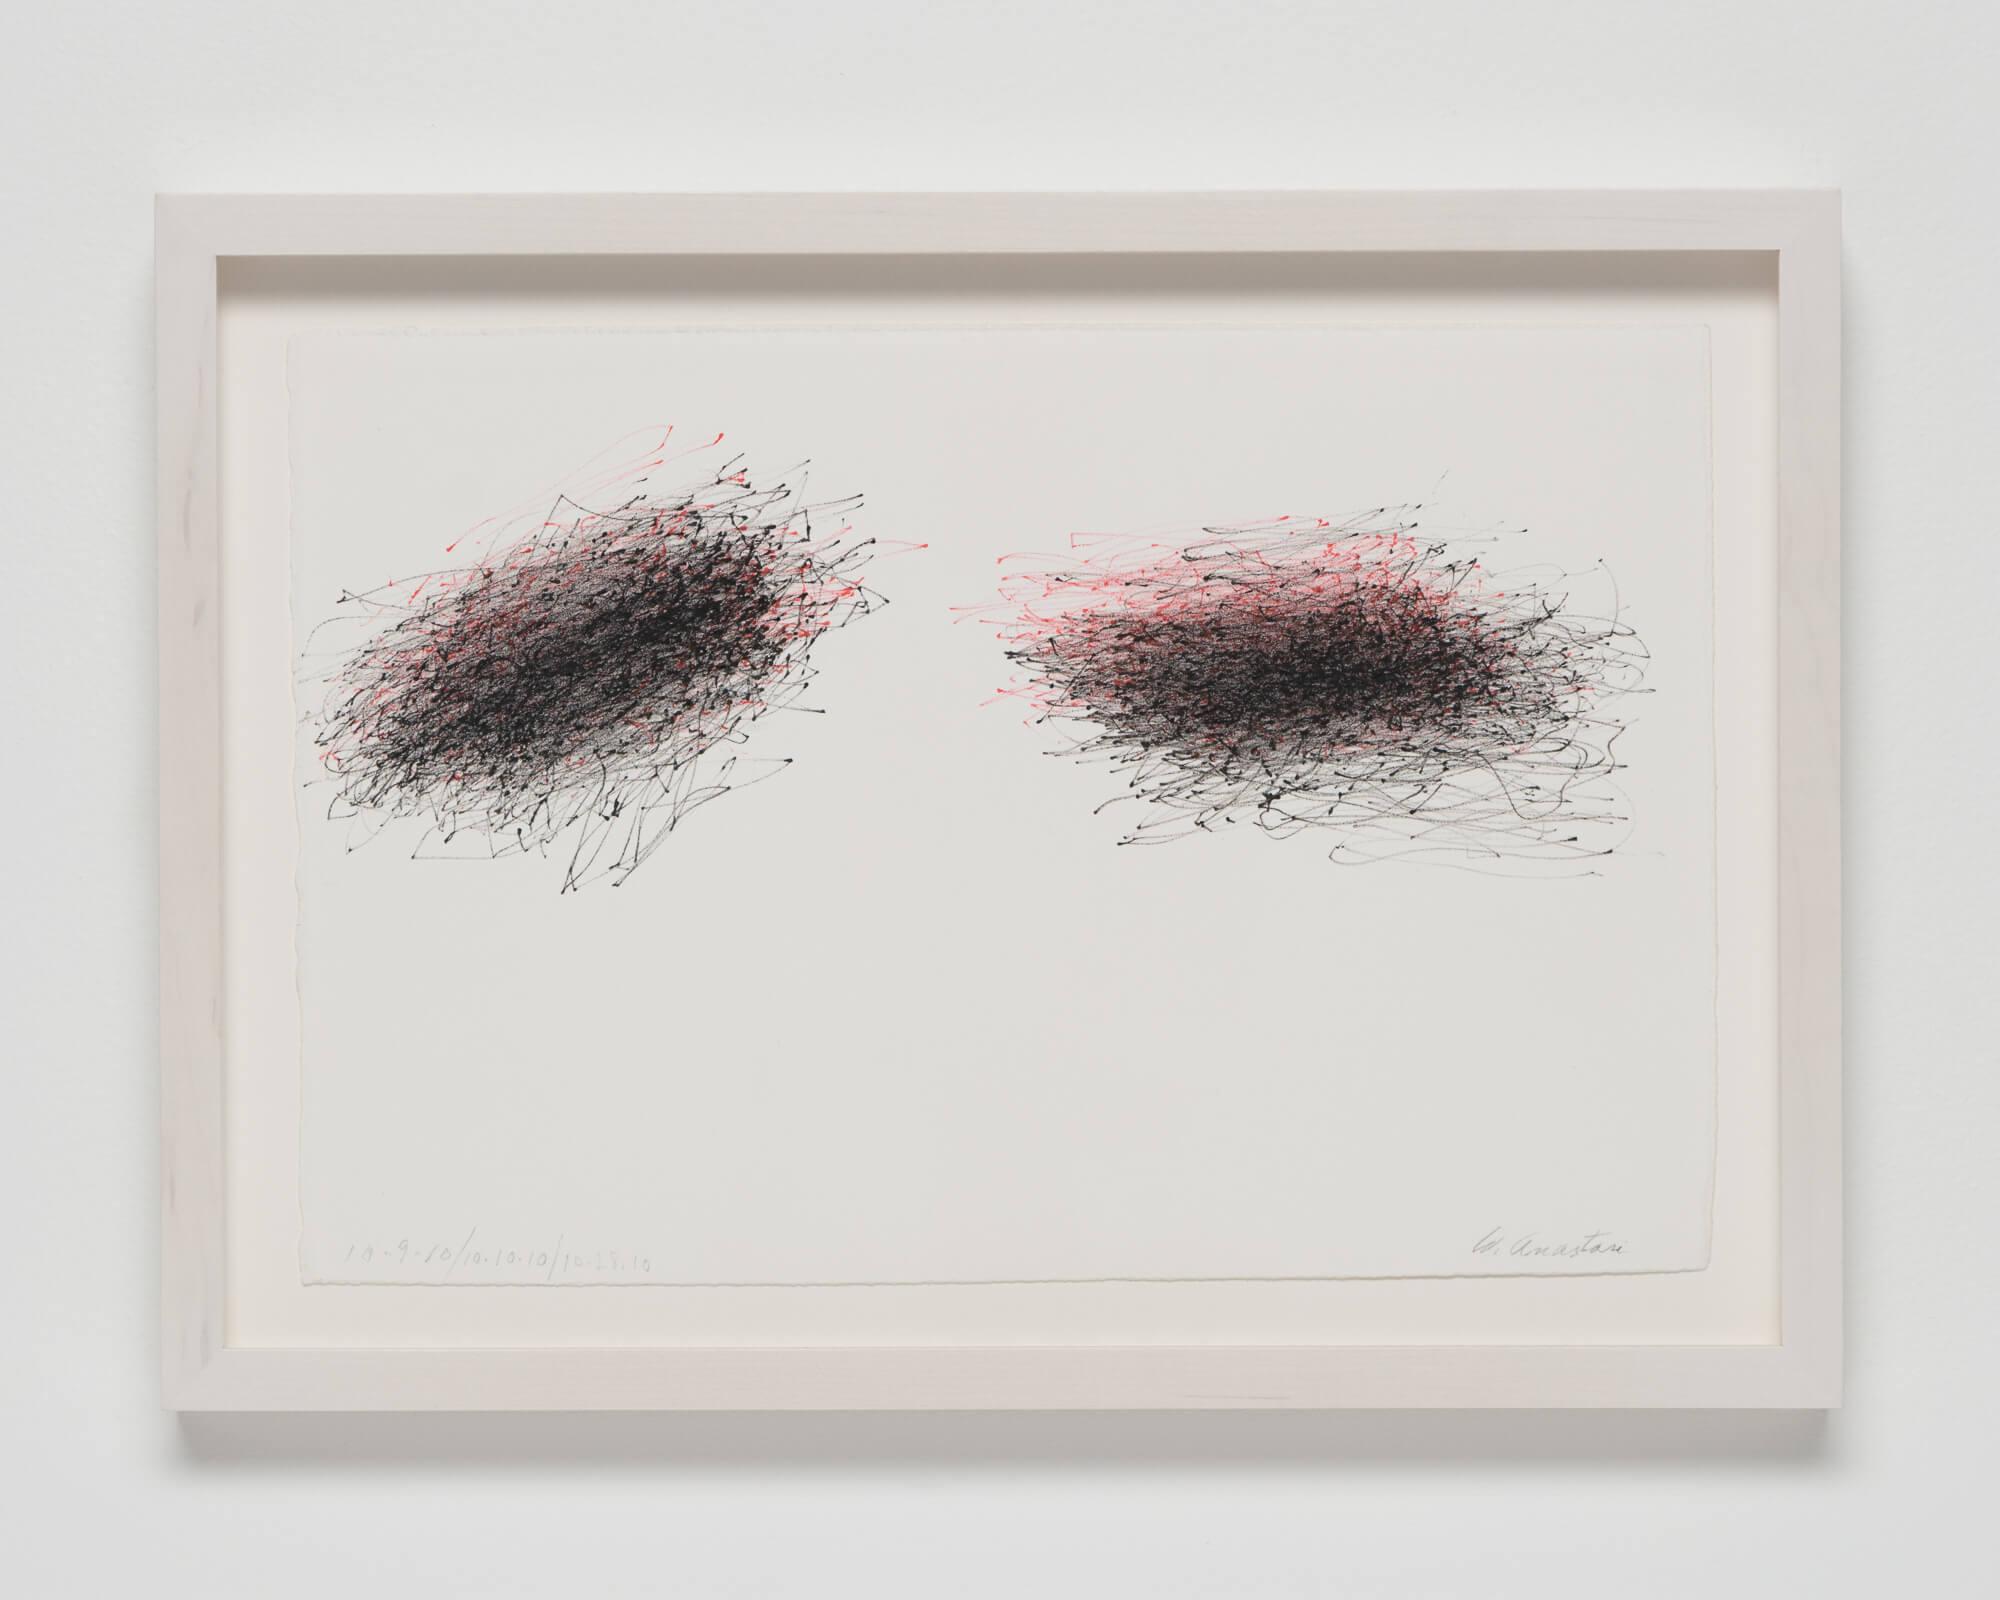 Anastasi, Untitled (Subway Drawing, 10.9.10, 10.10.10, 10.28.10), 2010 (WA 10.001) A